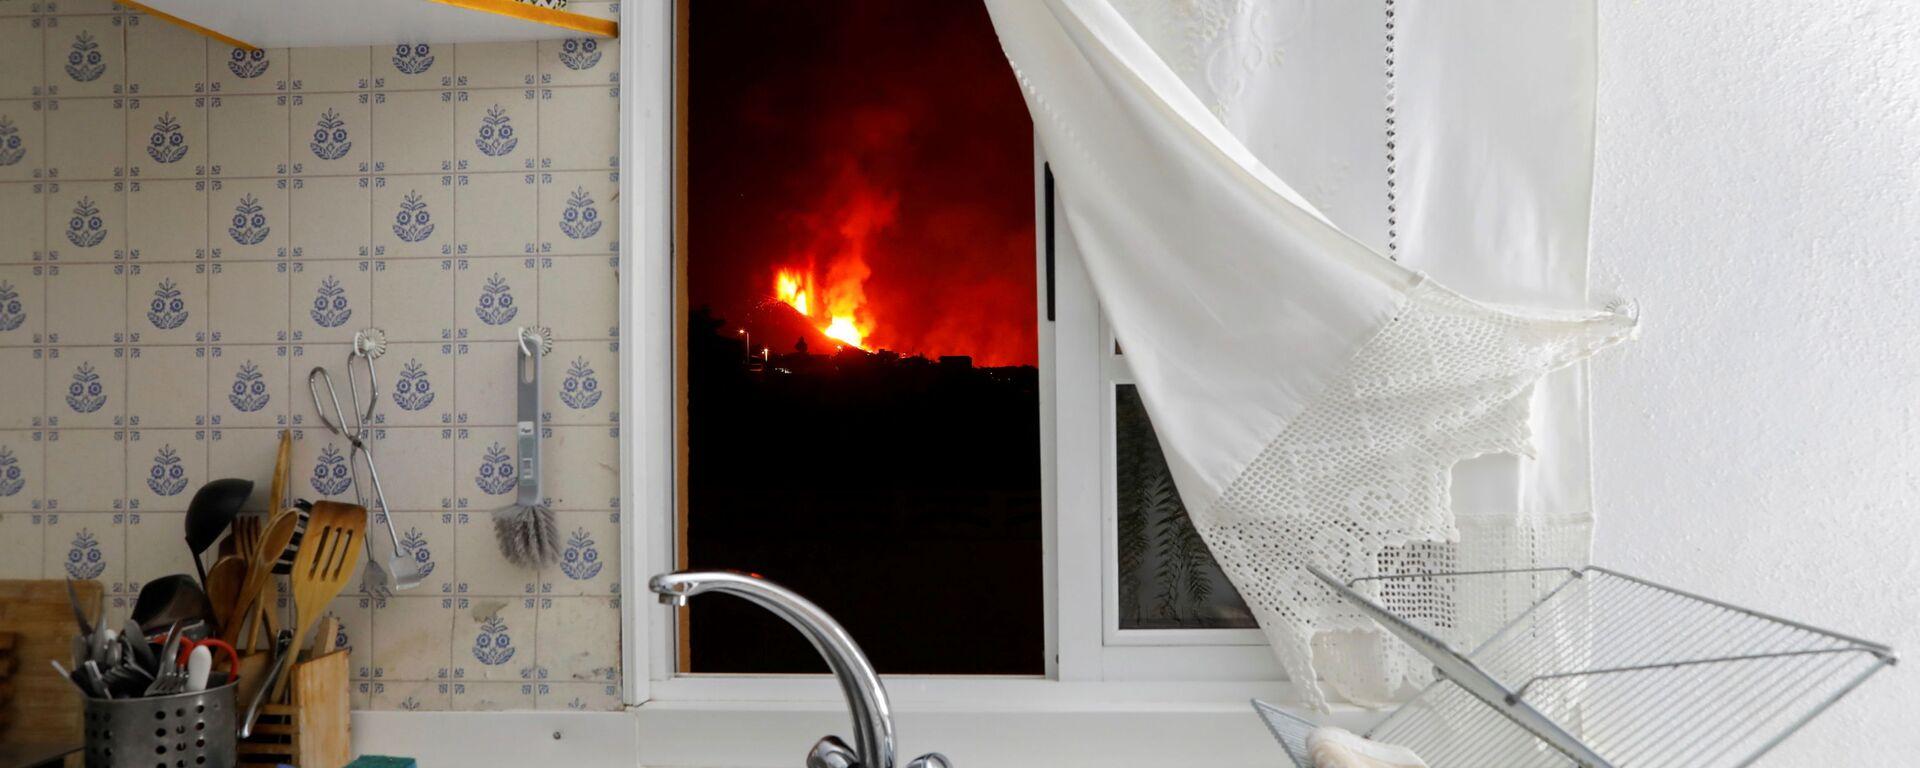 Vulkanausbruch auf La Palma - SNA, 1920, 04.10.2021